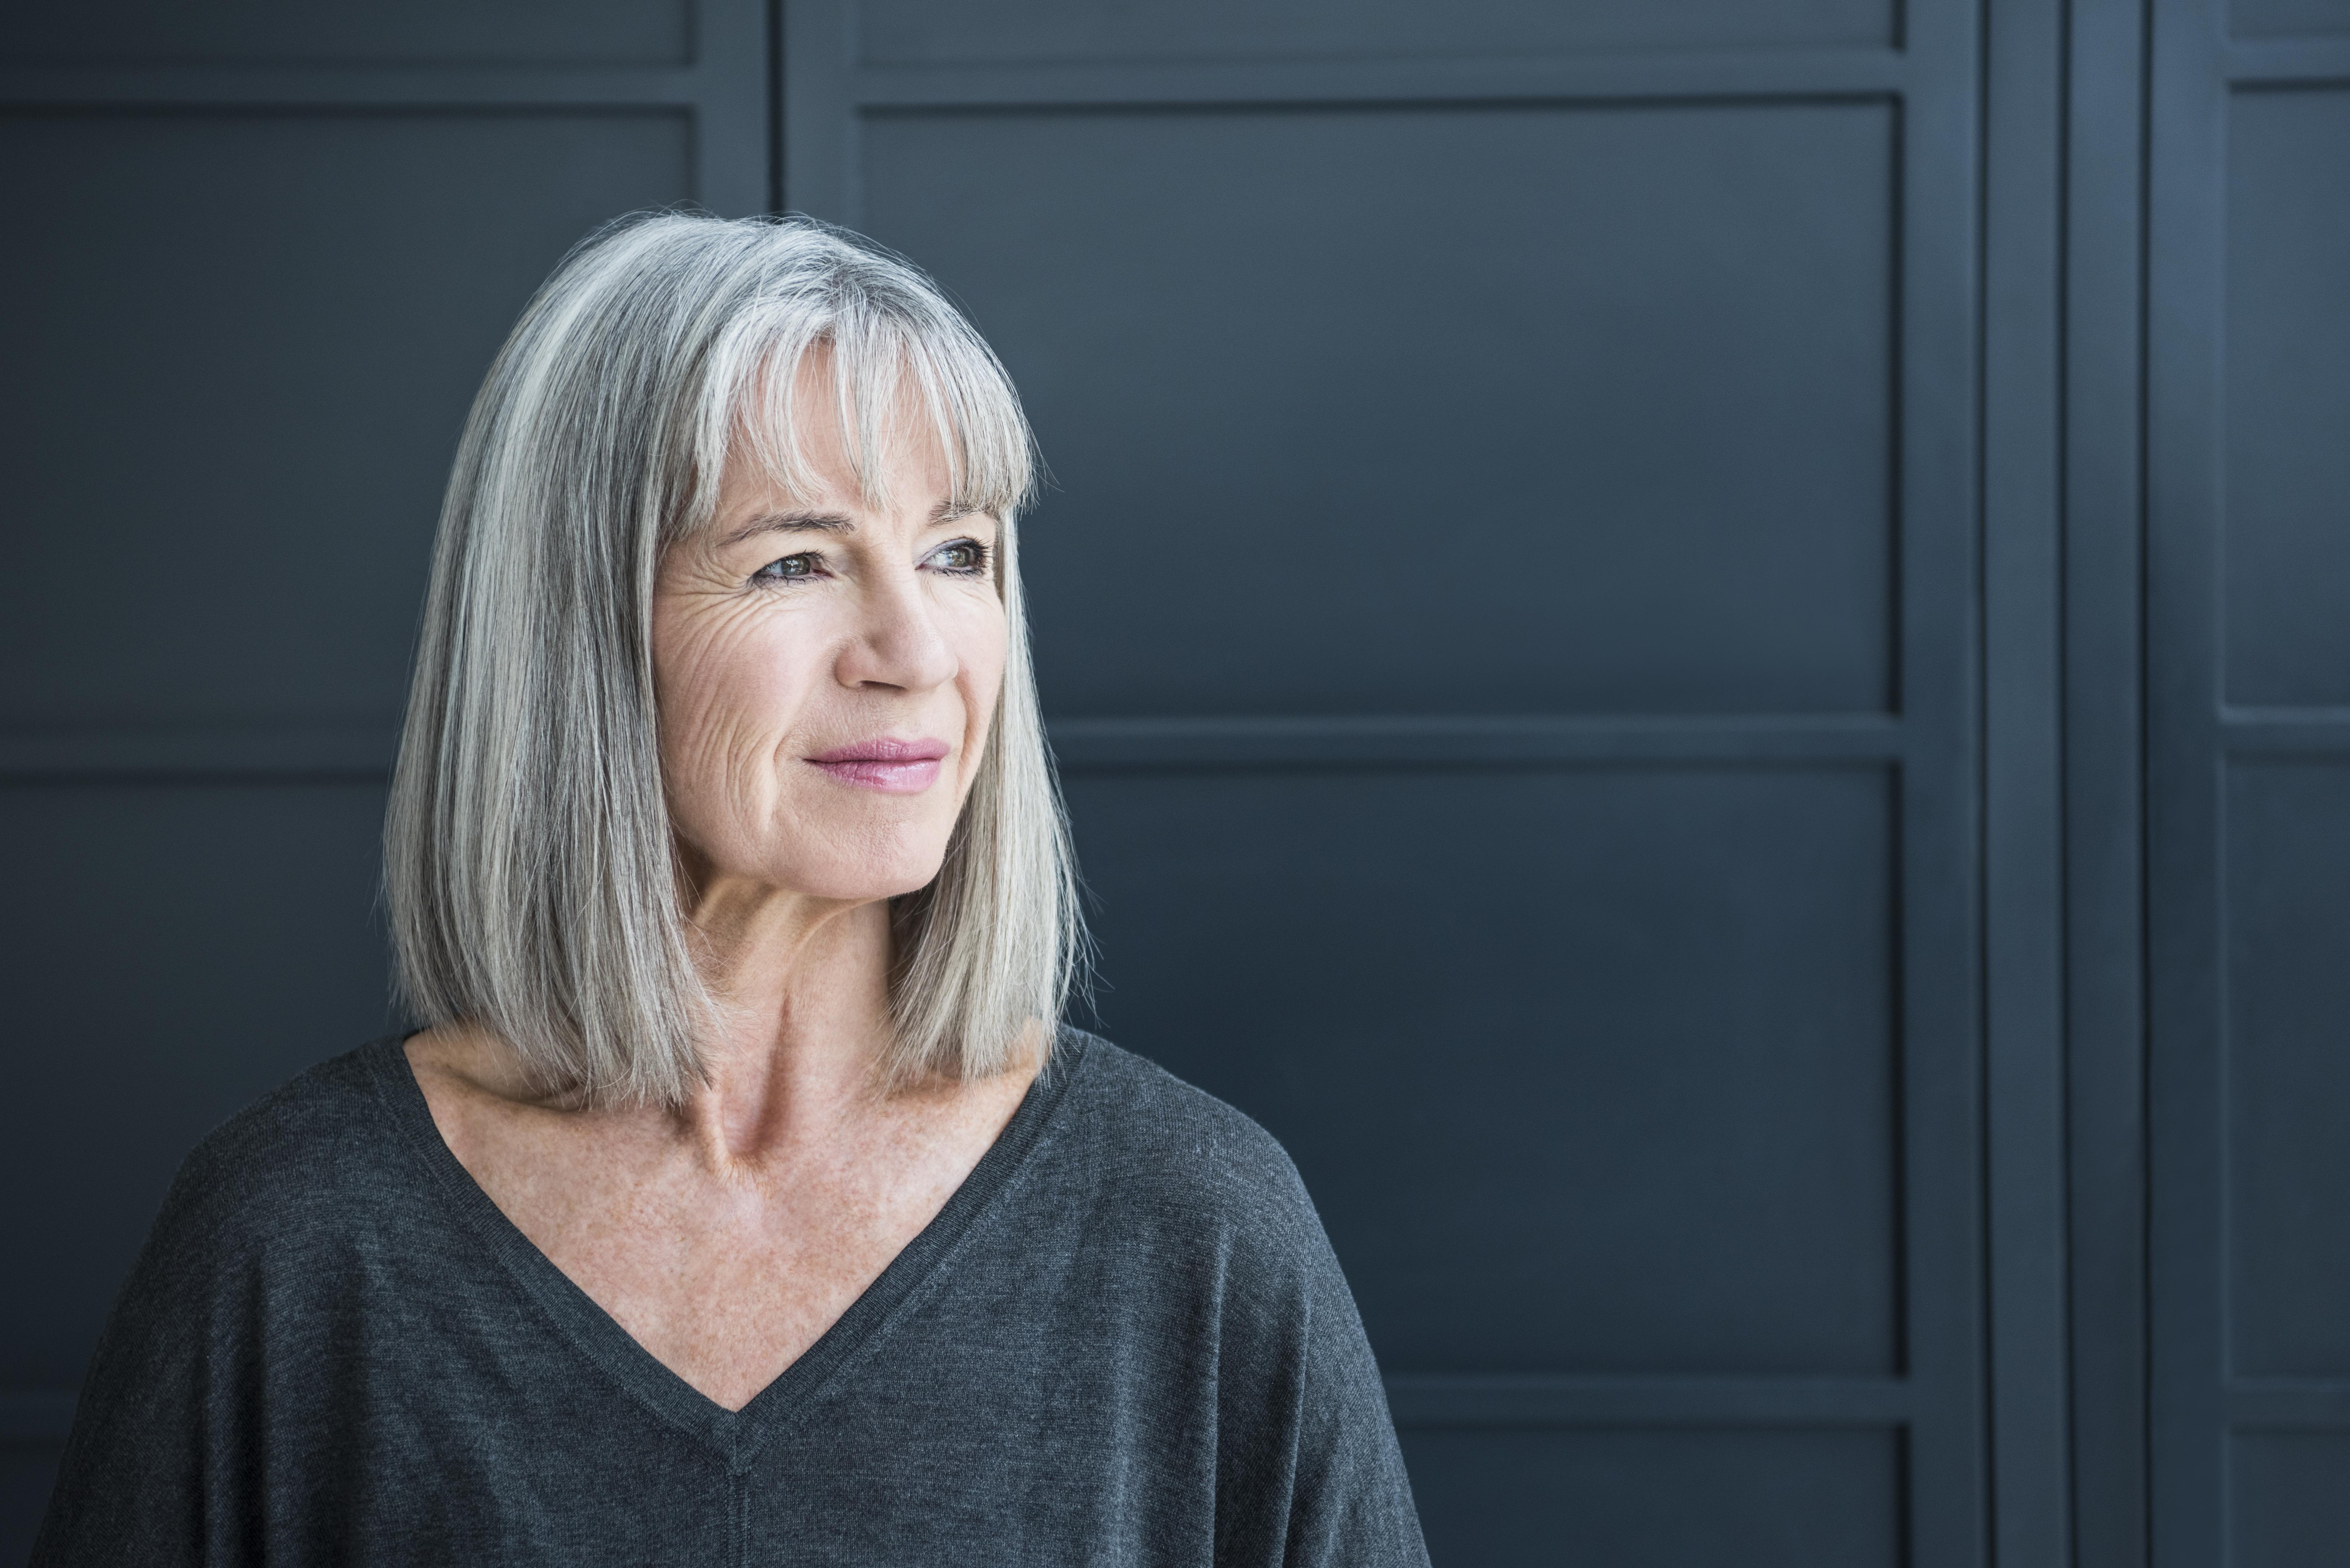 Frau ursachen 30 haare mit graue Graue Haare: